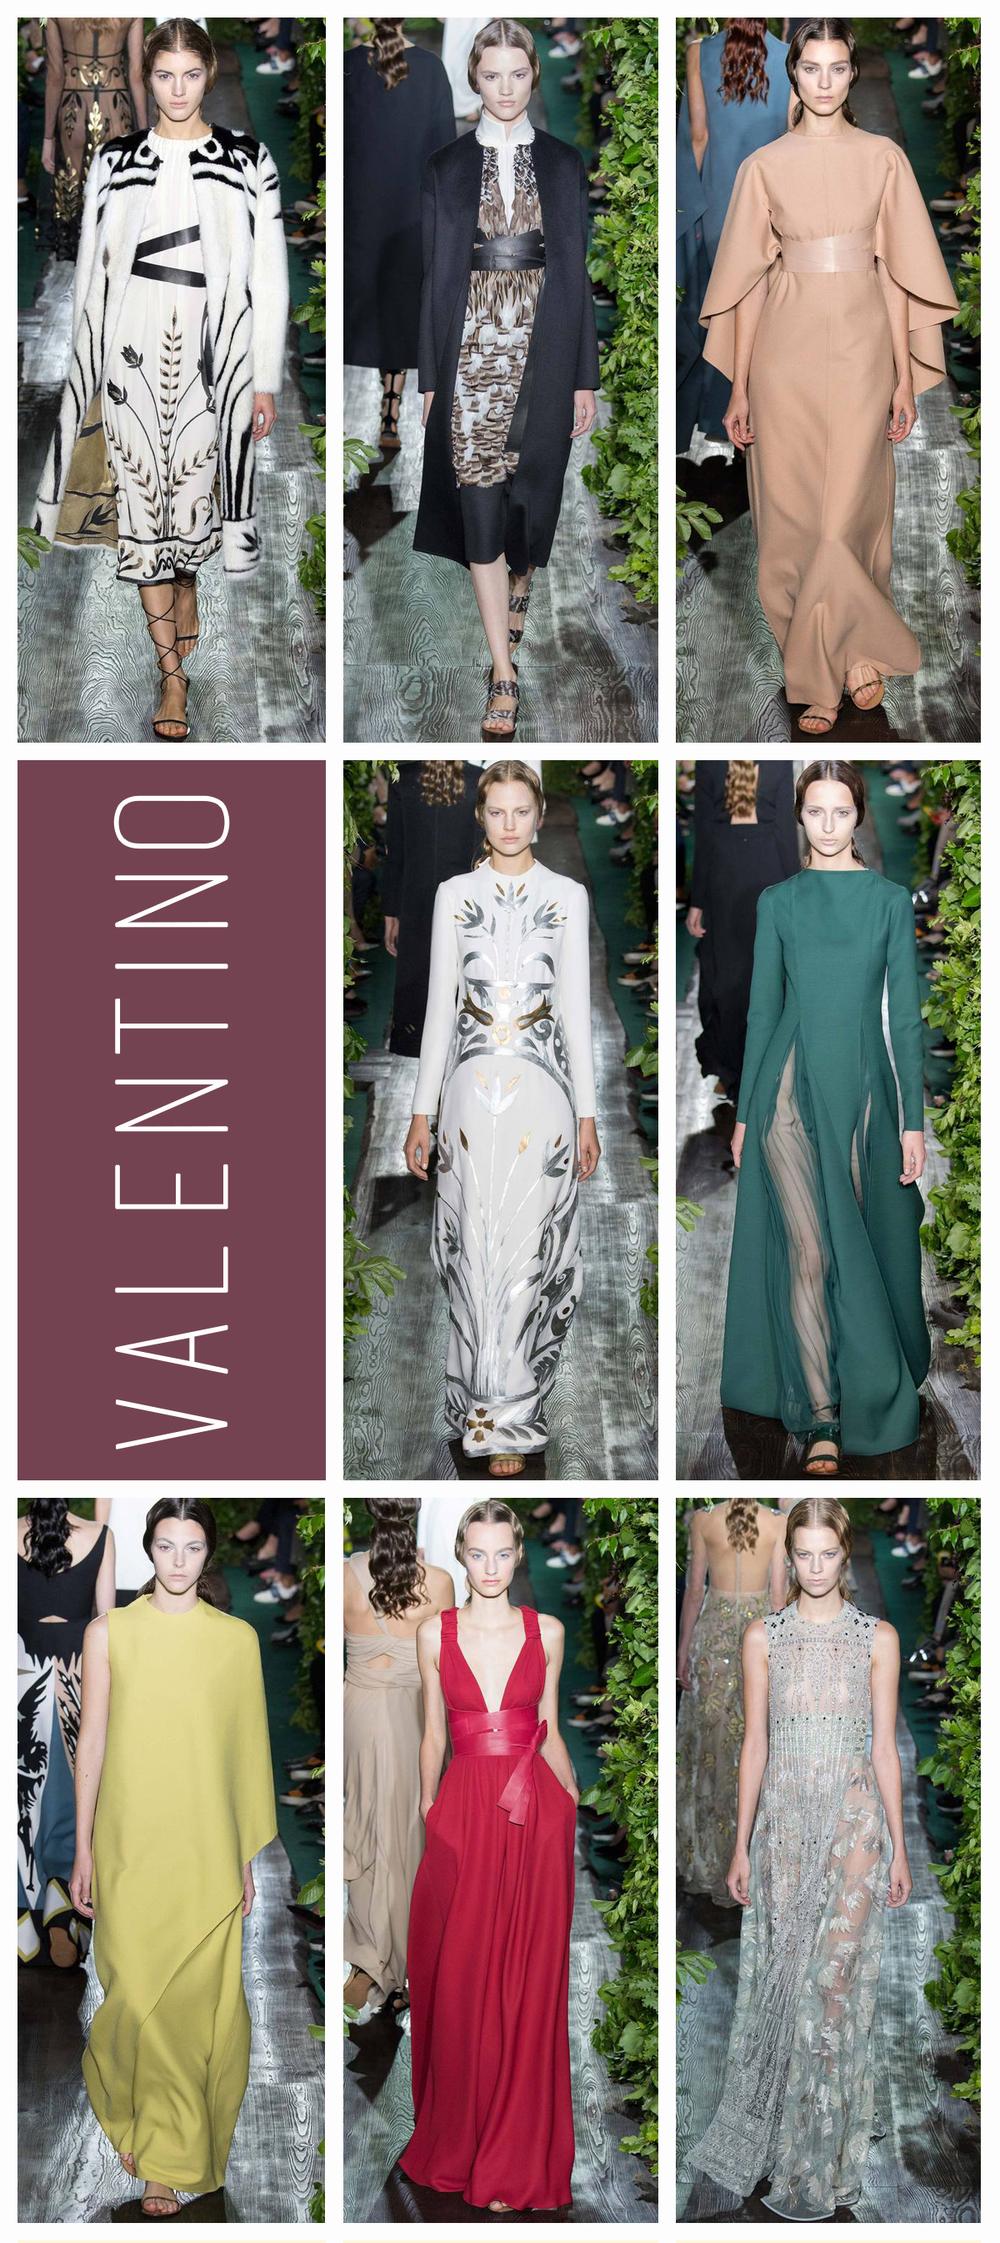 valentino fall couture 2014